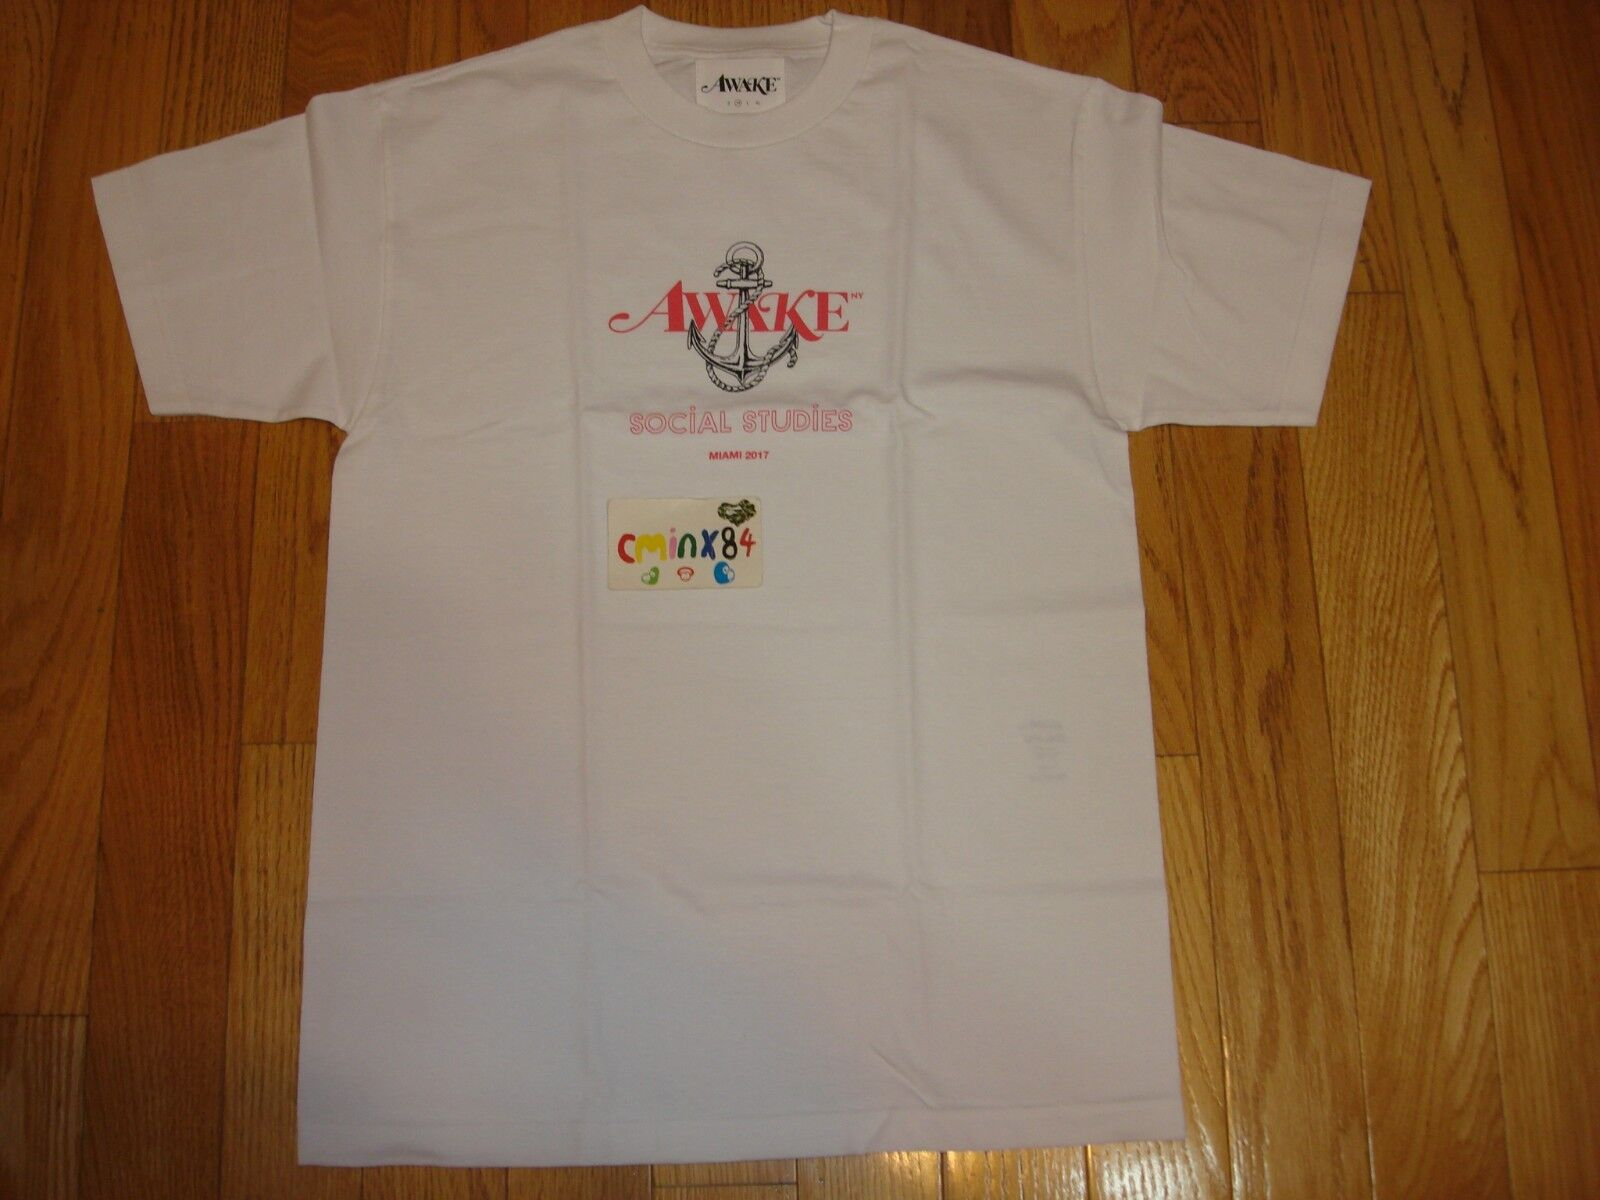 100% Authentic Awake NY Social Studies Tee Shirt Weiß sz Medium Art Basel Miami